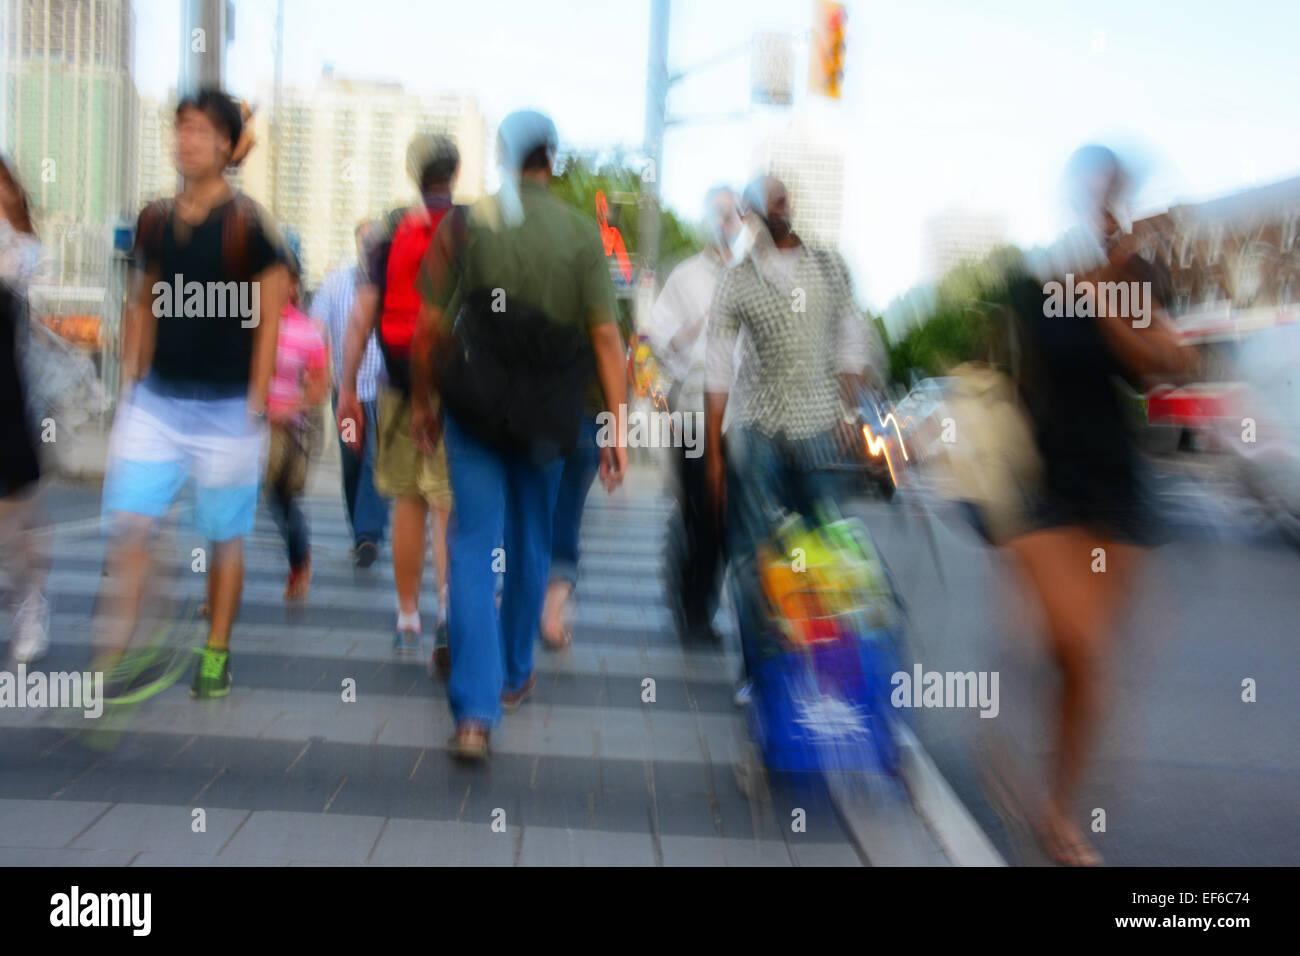 People on Crosswalk ,Toronto, Canada - Stock Image